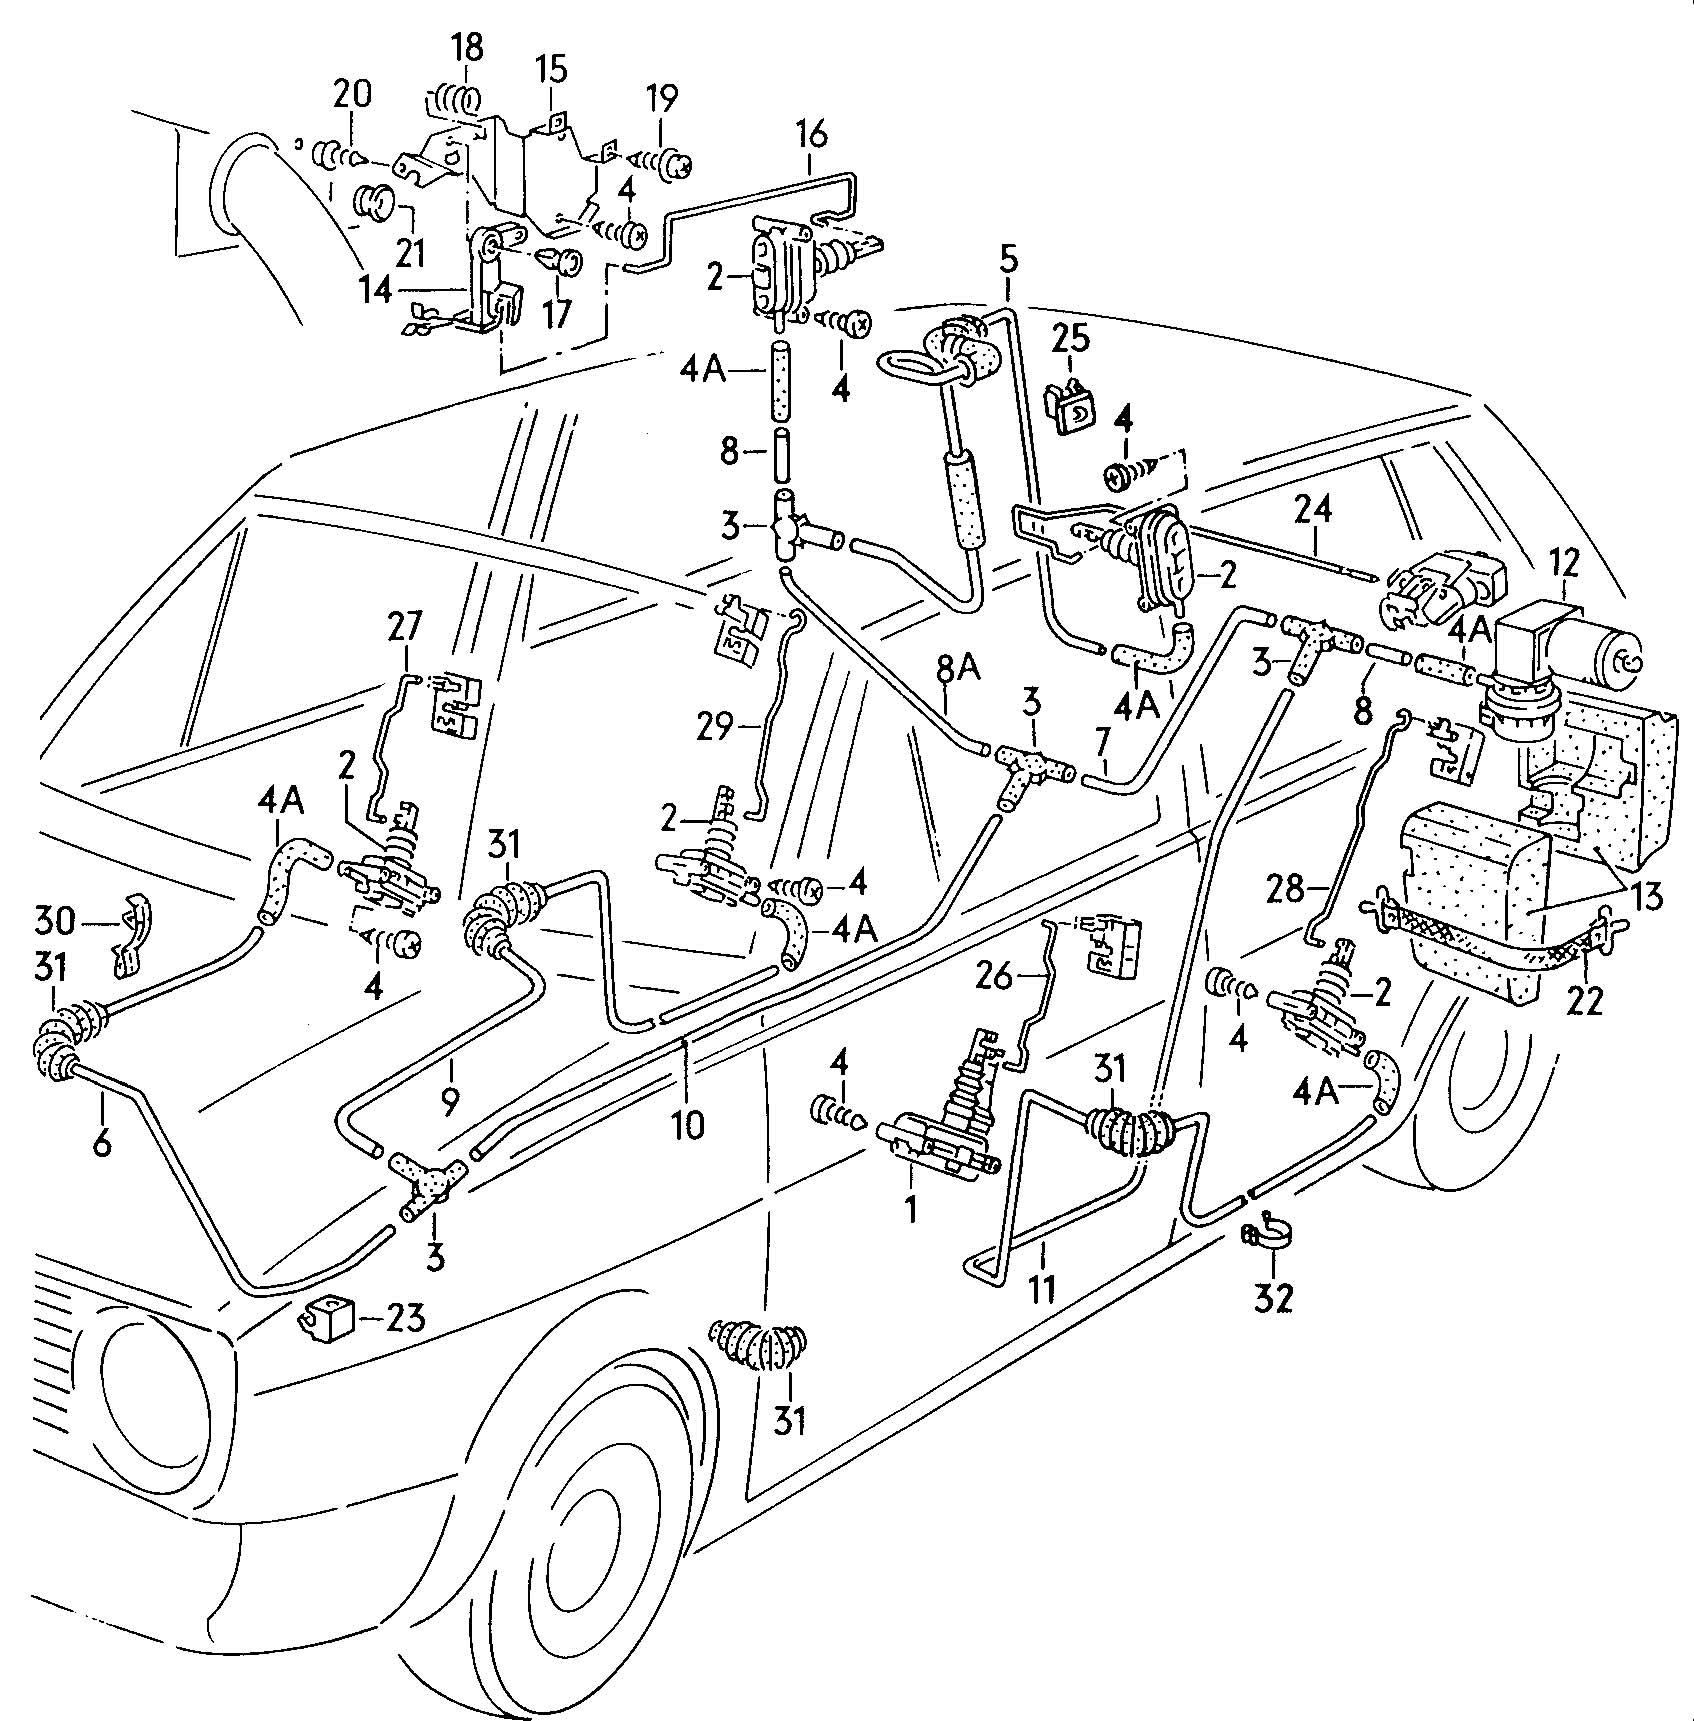 Volkswagen Jetta Pillar A Inner Hose Shorten To